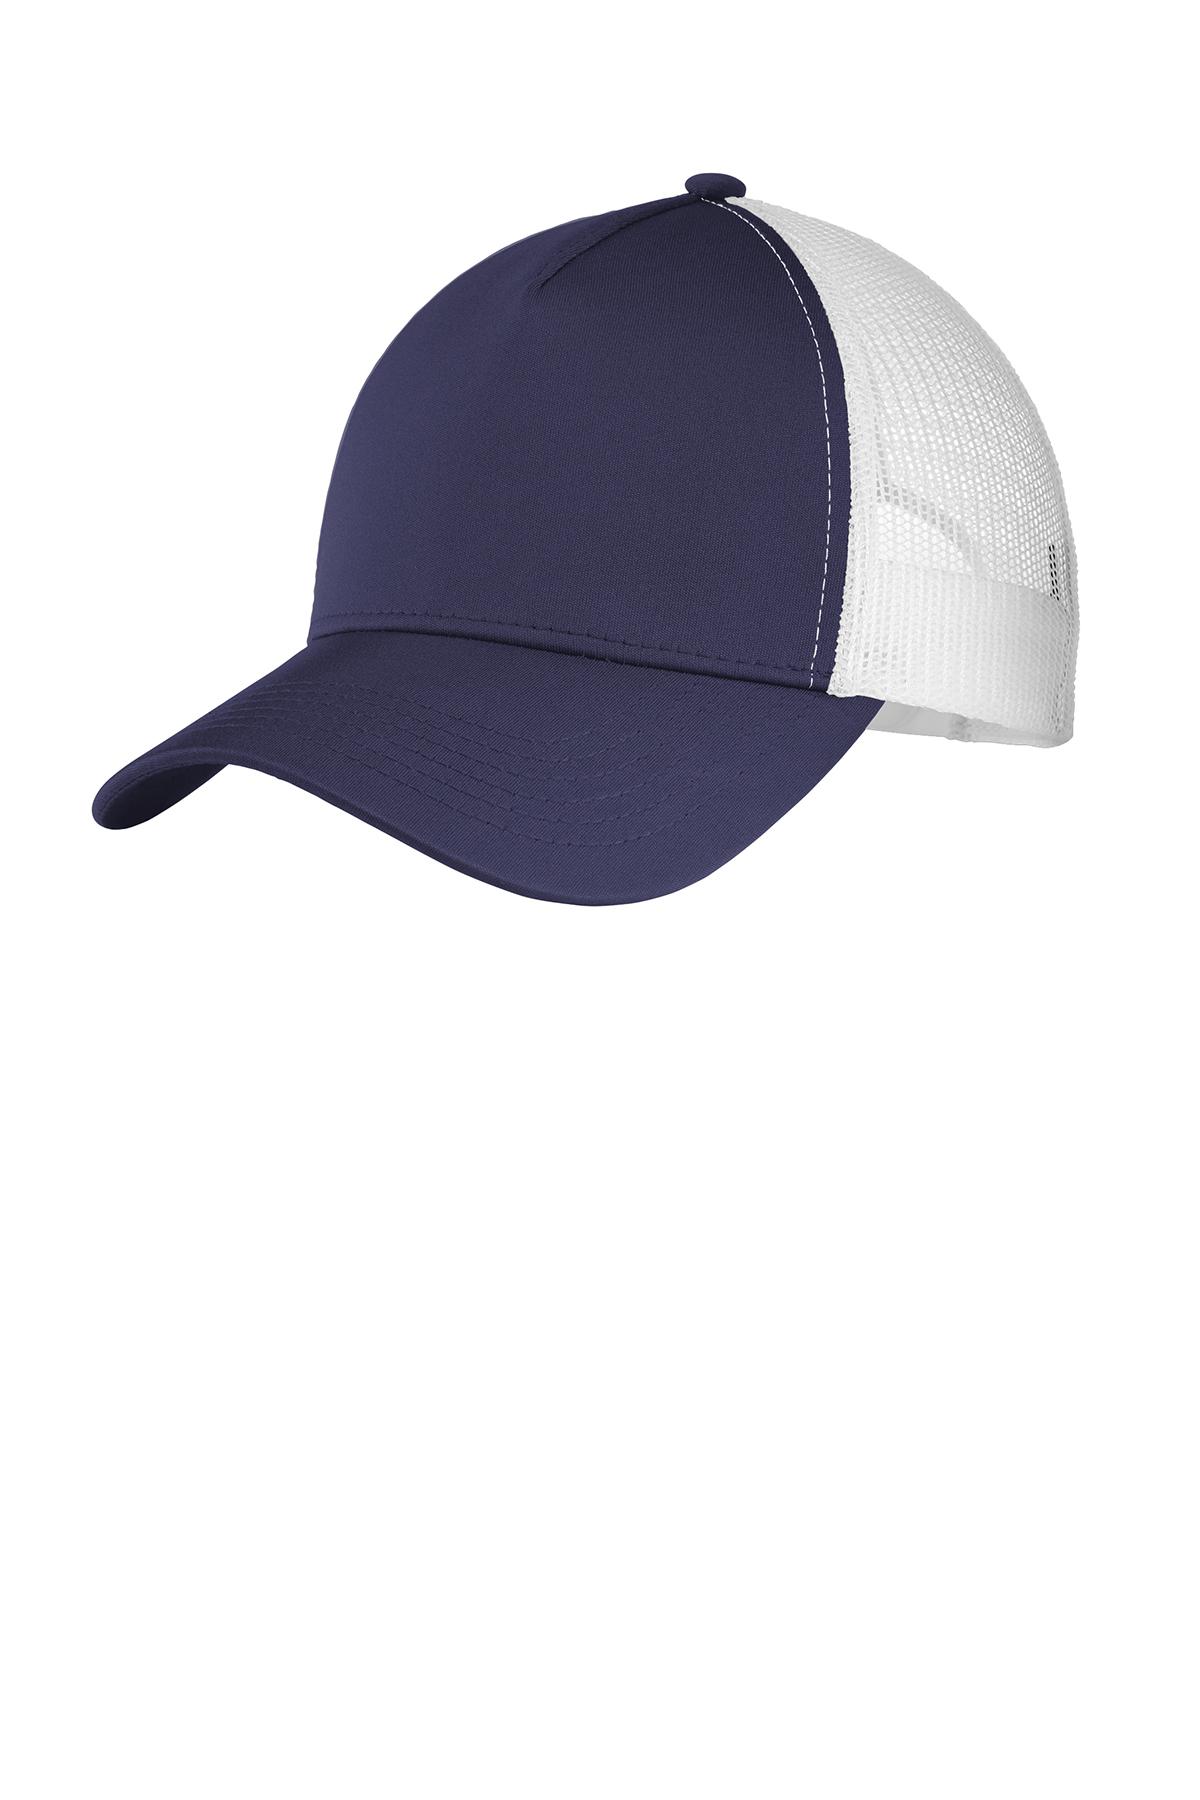 488aeeb4d5ad1 Sport-Tek ® PosiCharge ® Competitor ™ Mesh Back Cap